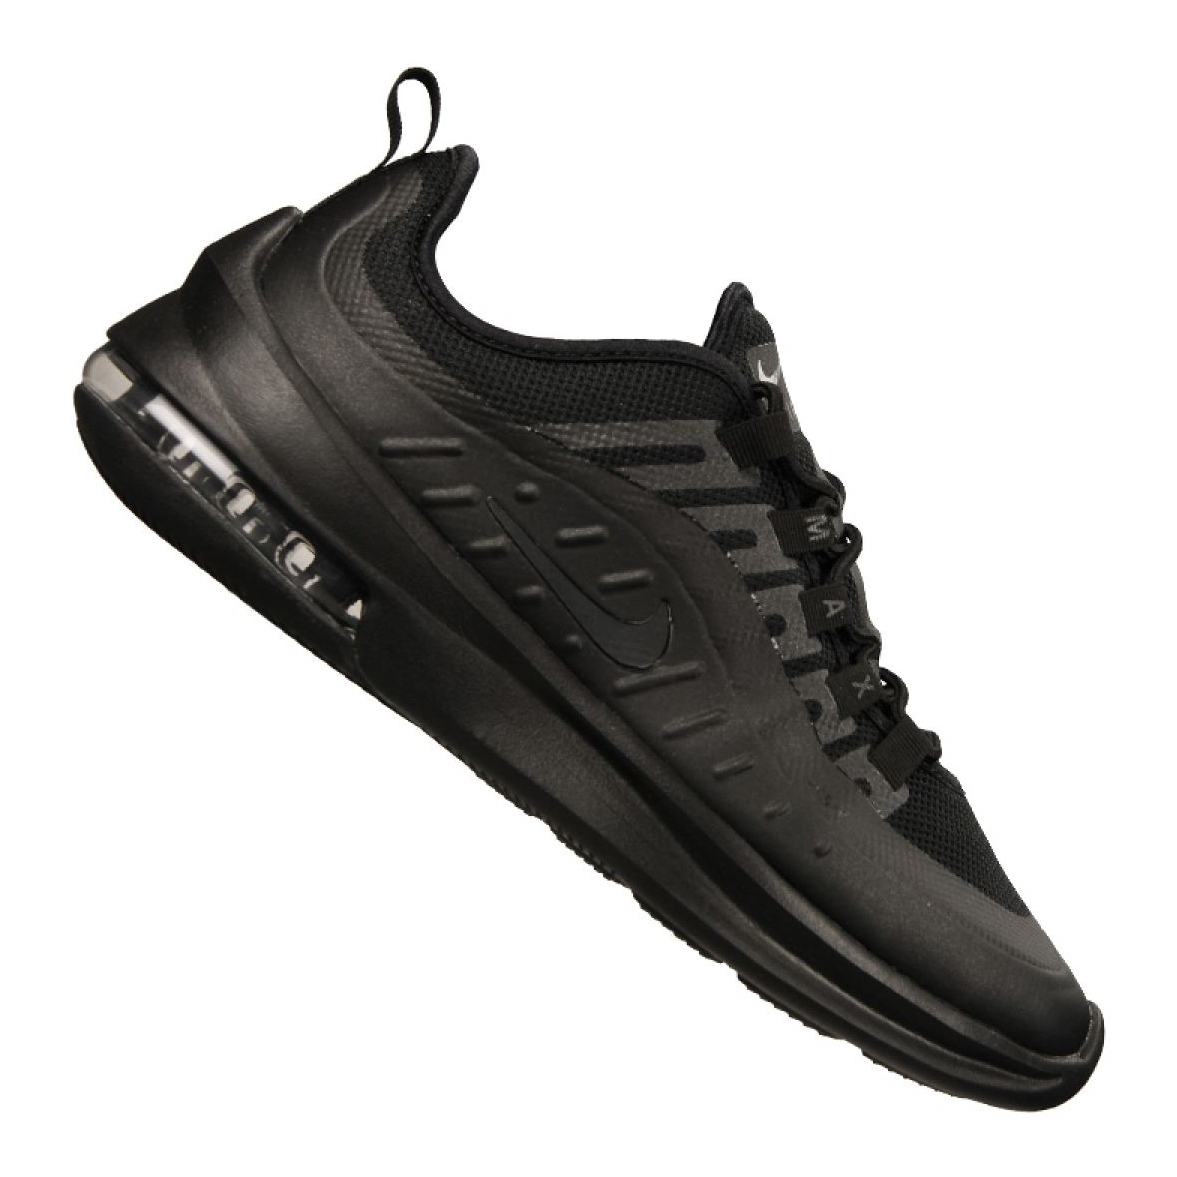 Black Nike Air Max Axis M AA2146 006 shoes